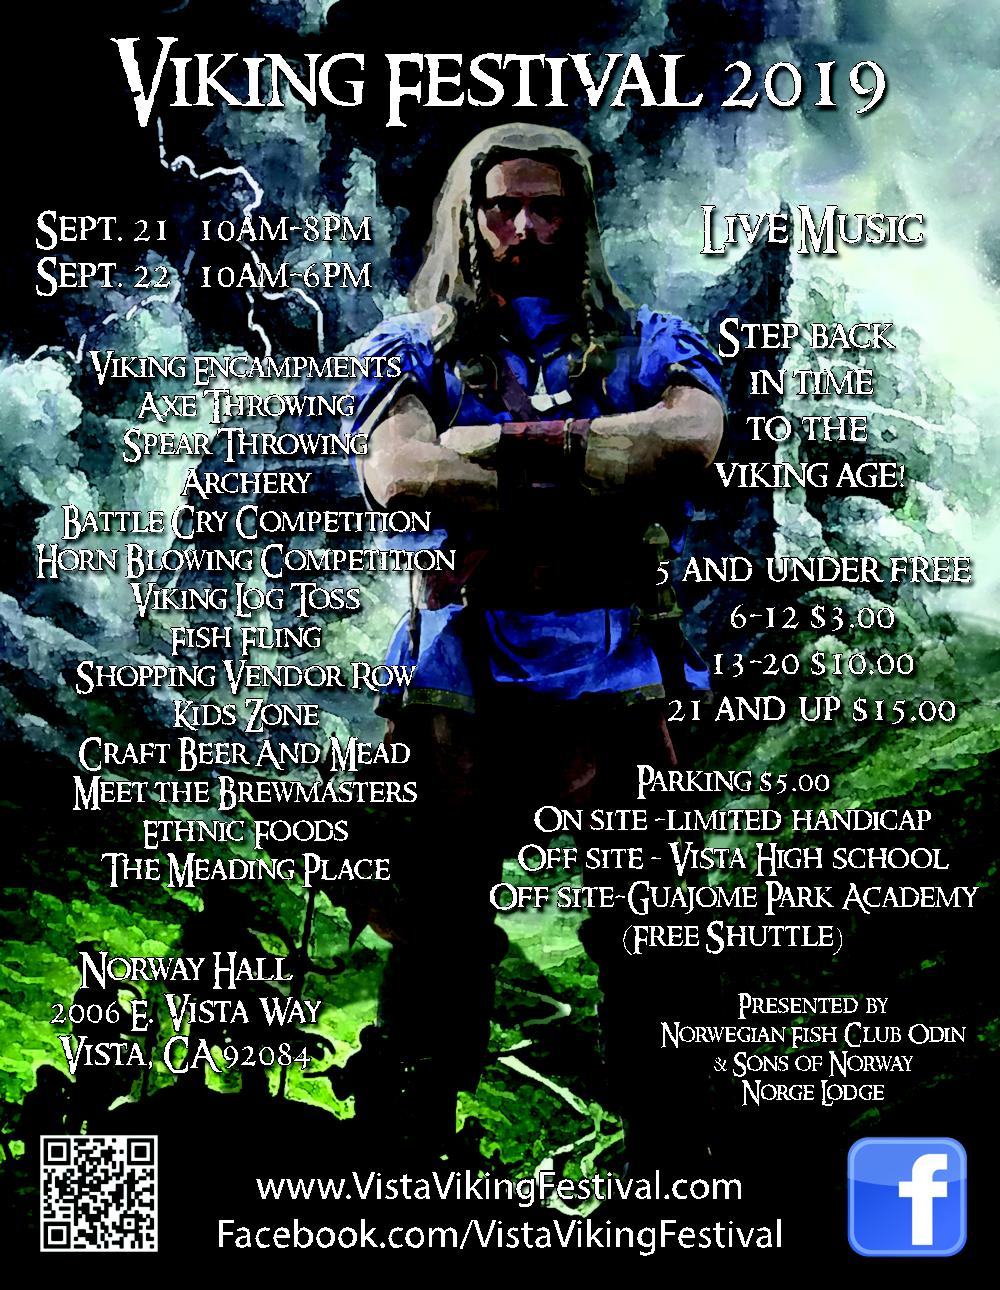 Odin of Vista Viking Festival and Norwegian Fish Club Odin.